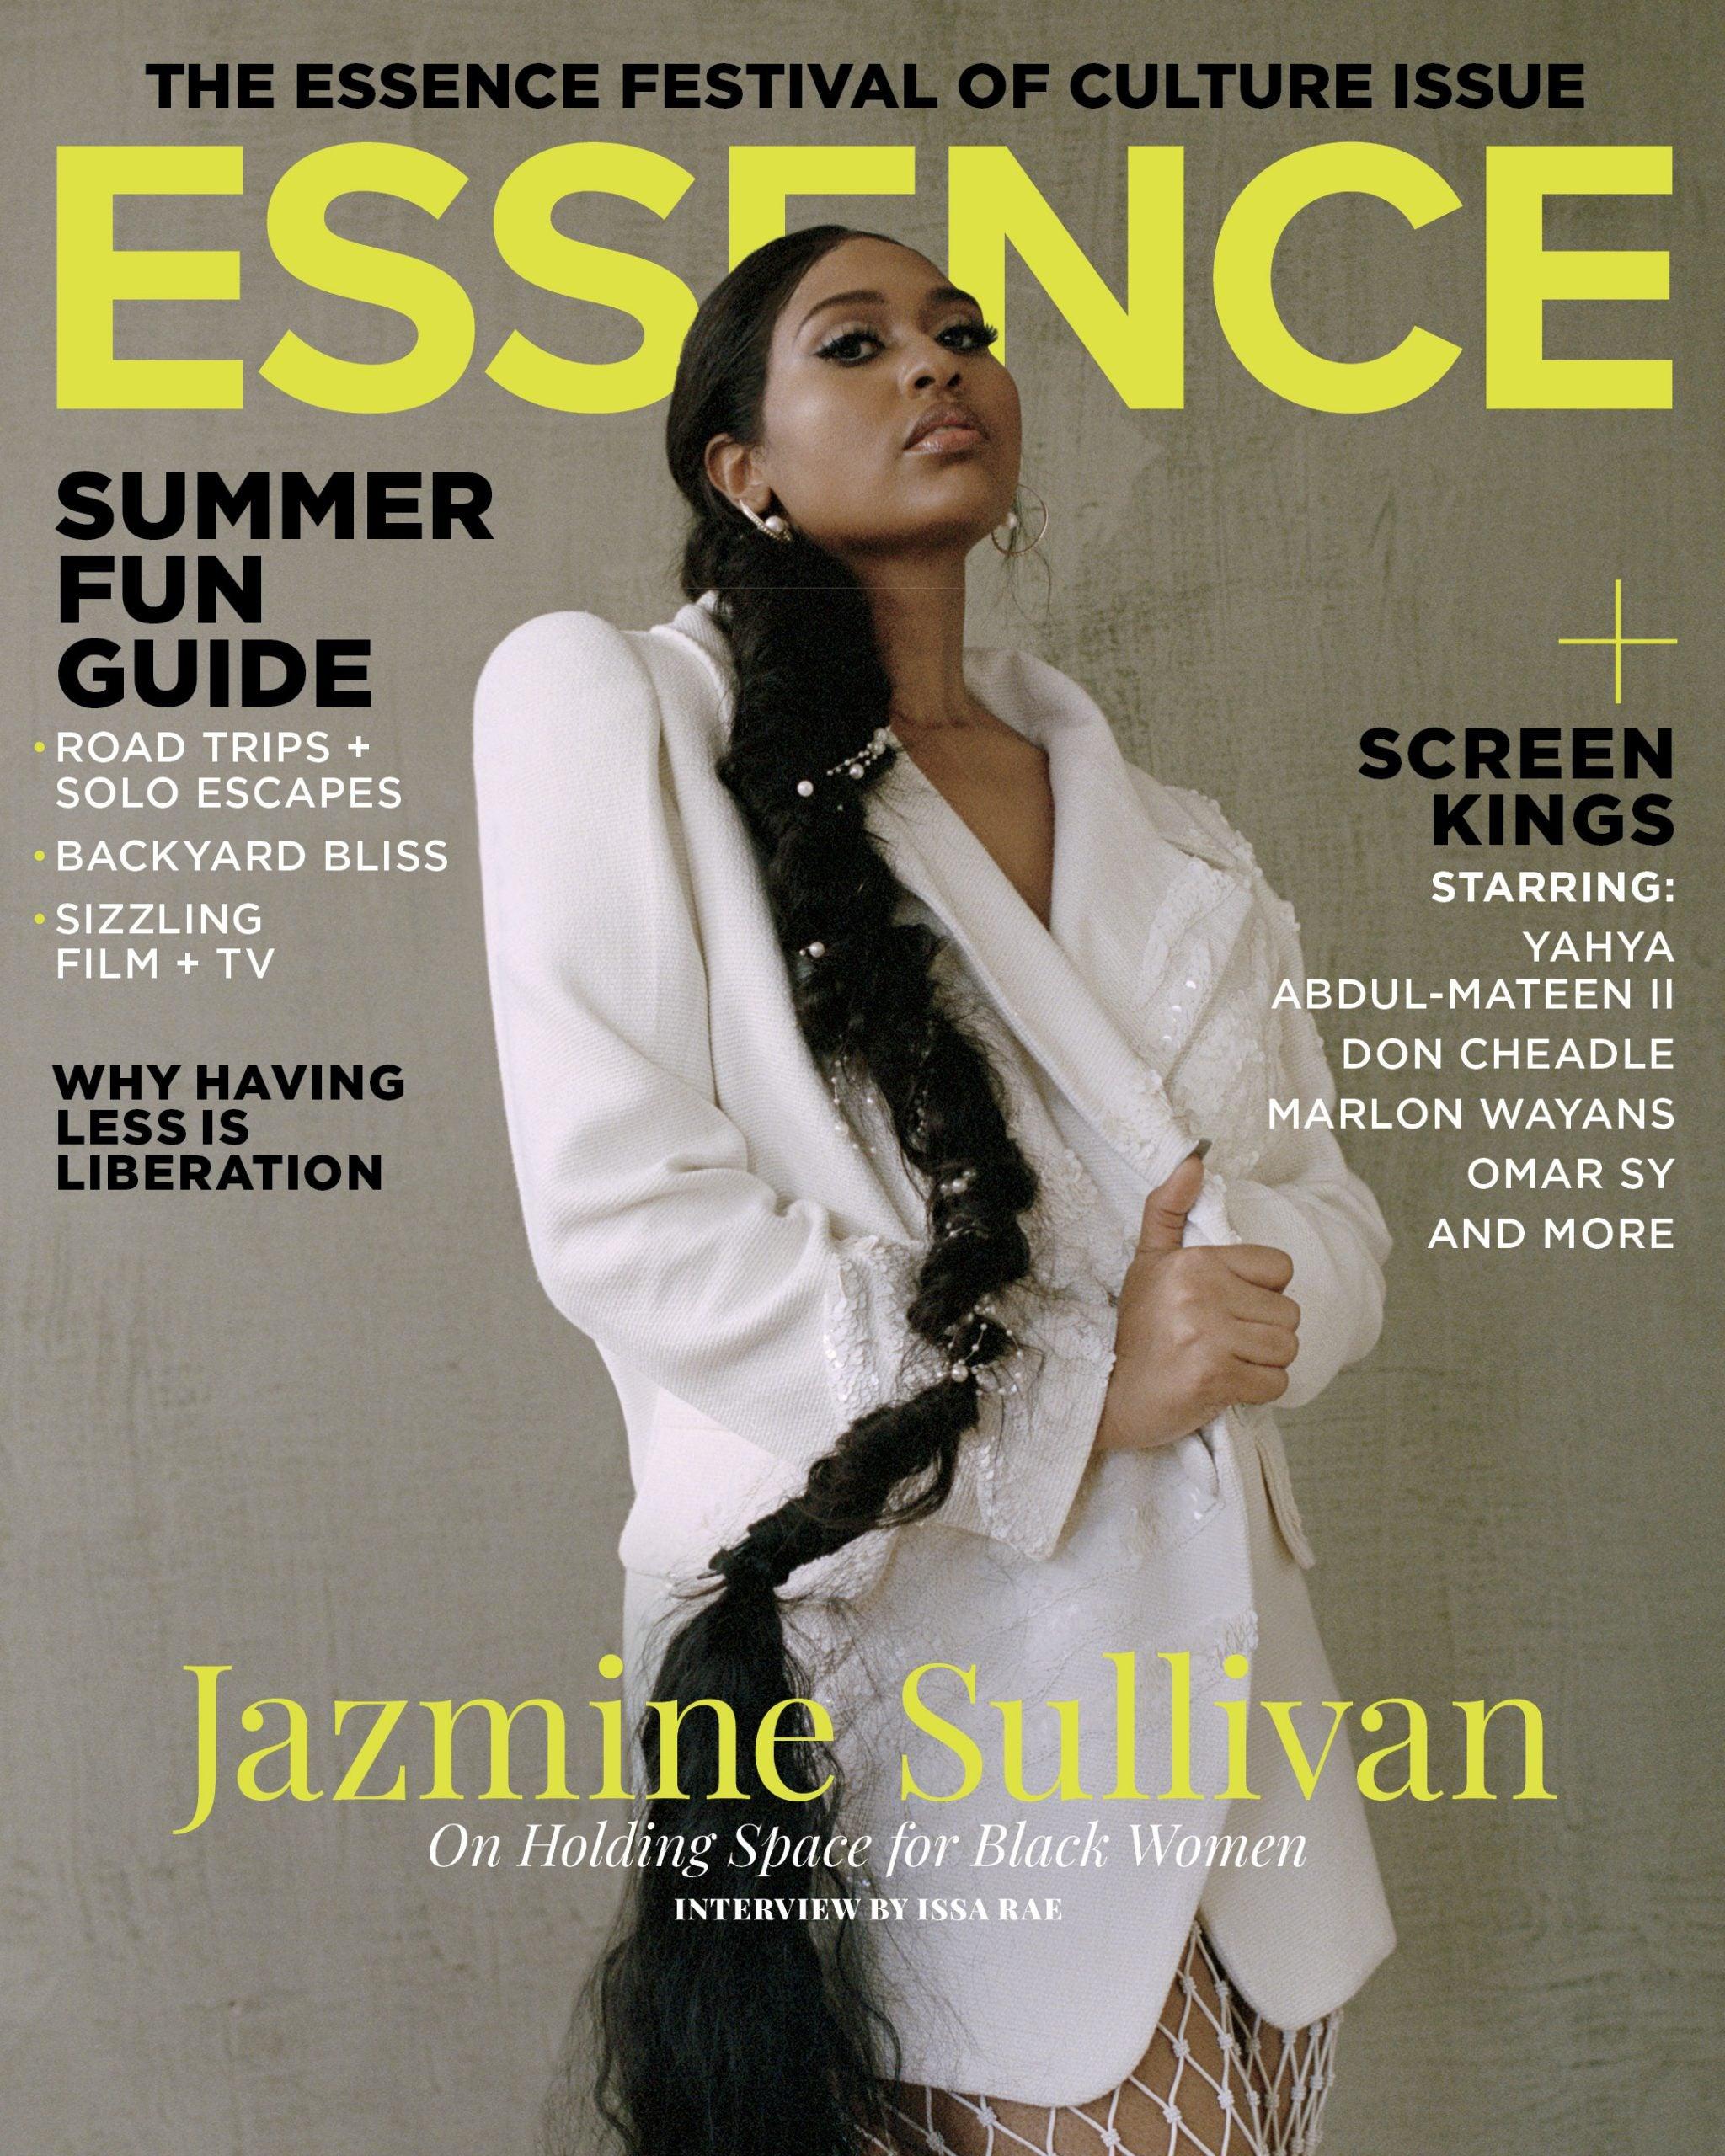 Jazmine Sullivan's 8 Best Song Covers - Essence